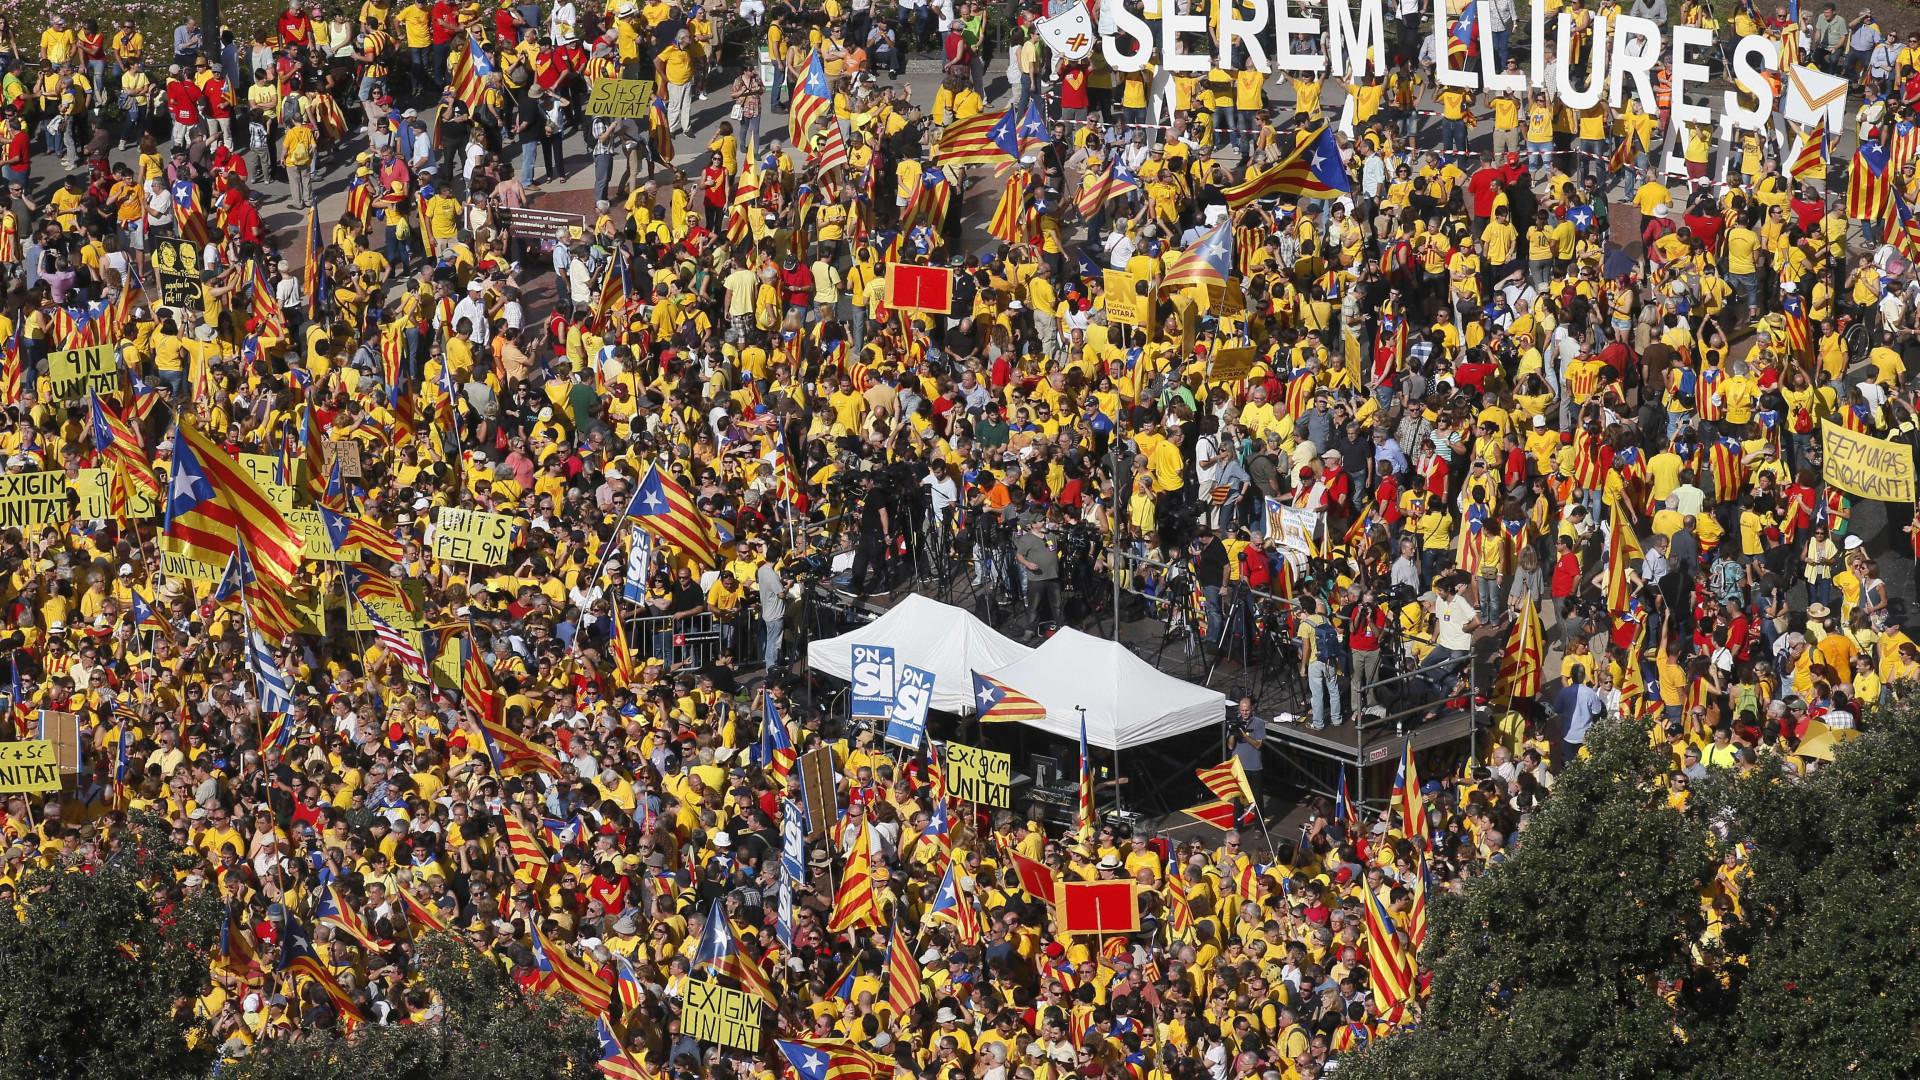 Parlamento da Catalunha aprova referendo separatista. Governo recorre